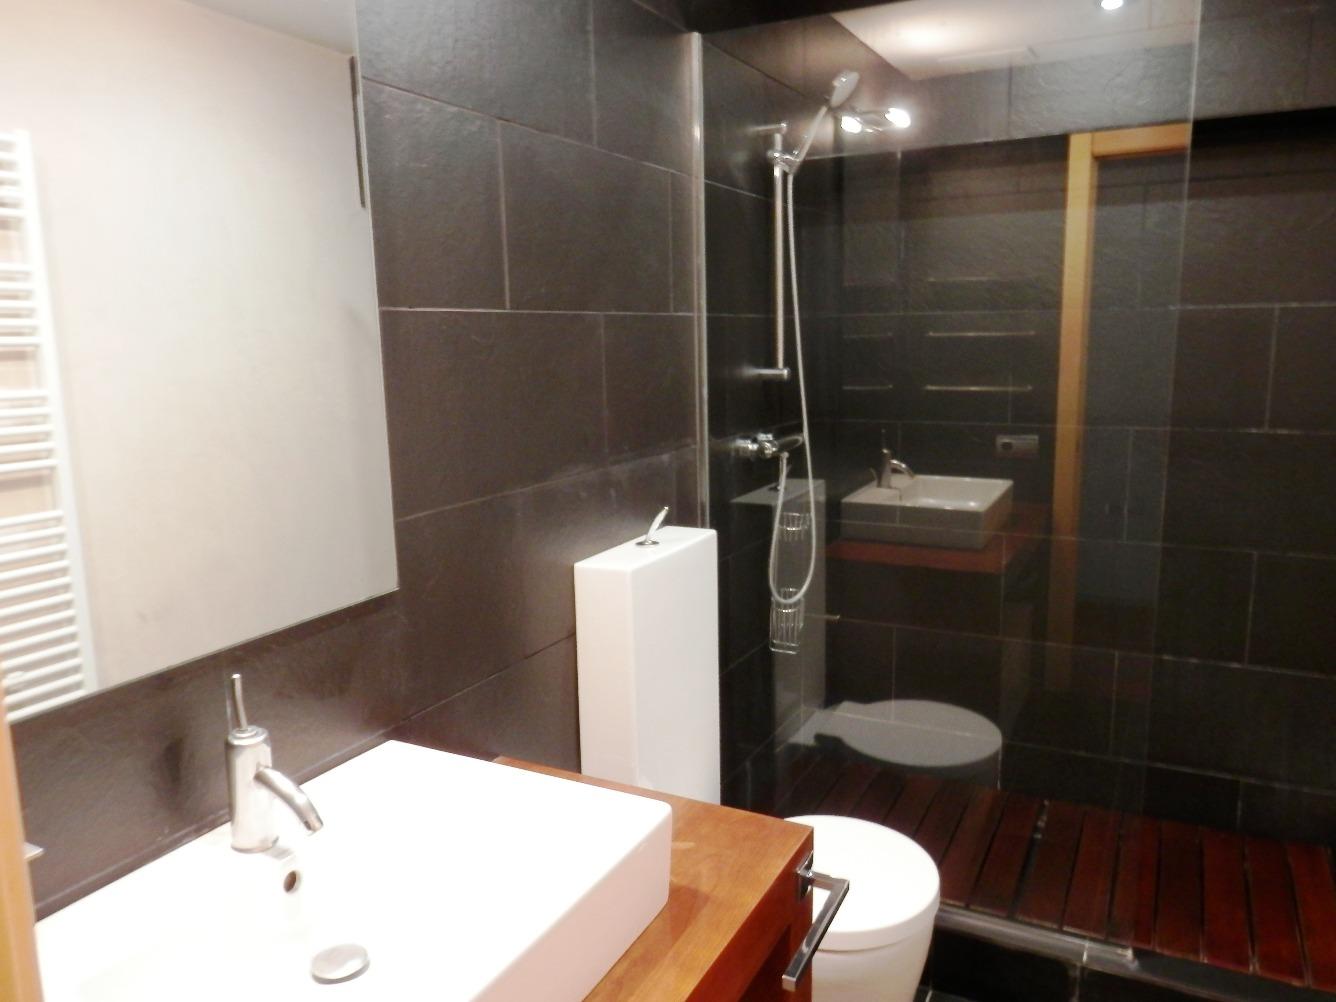 Alquiler pisos baratos en cambrils habitaclia - Pisos alquiler londres baratos ...